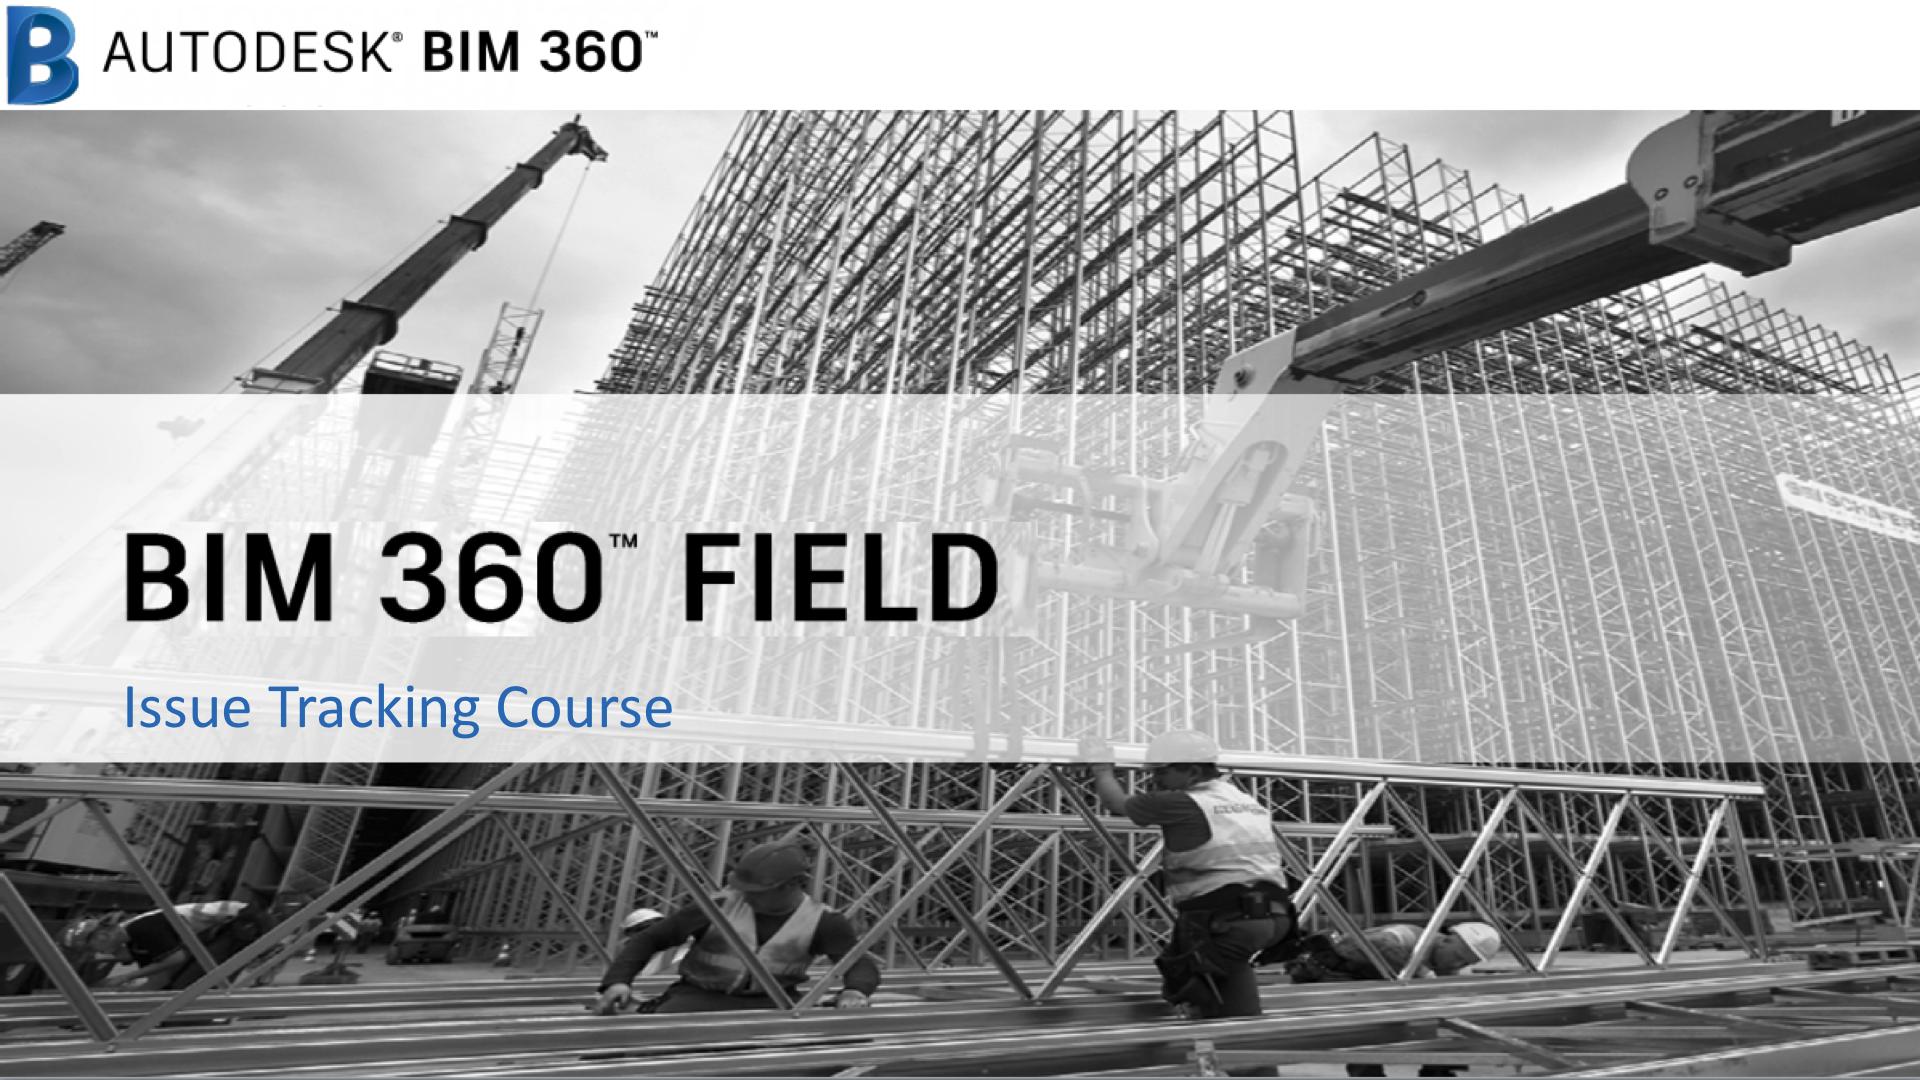 BIM 360 Field: Issue Tracking